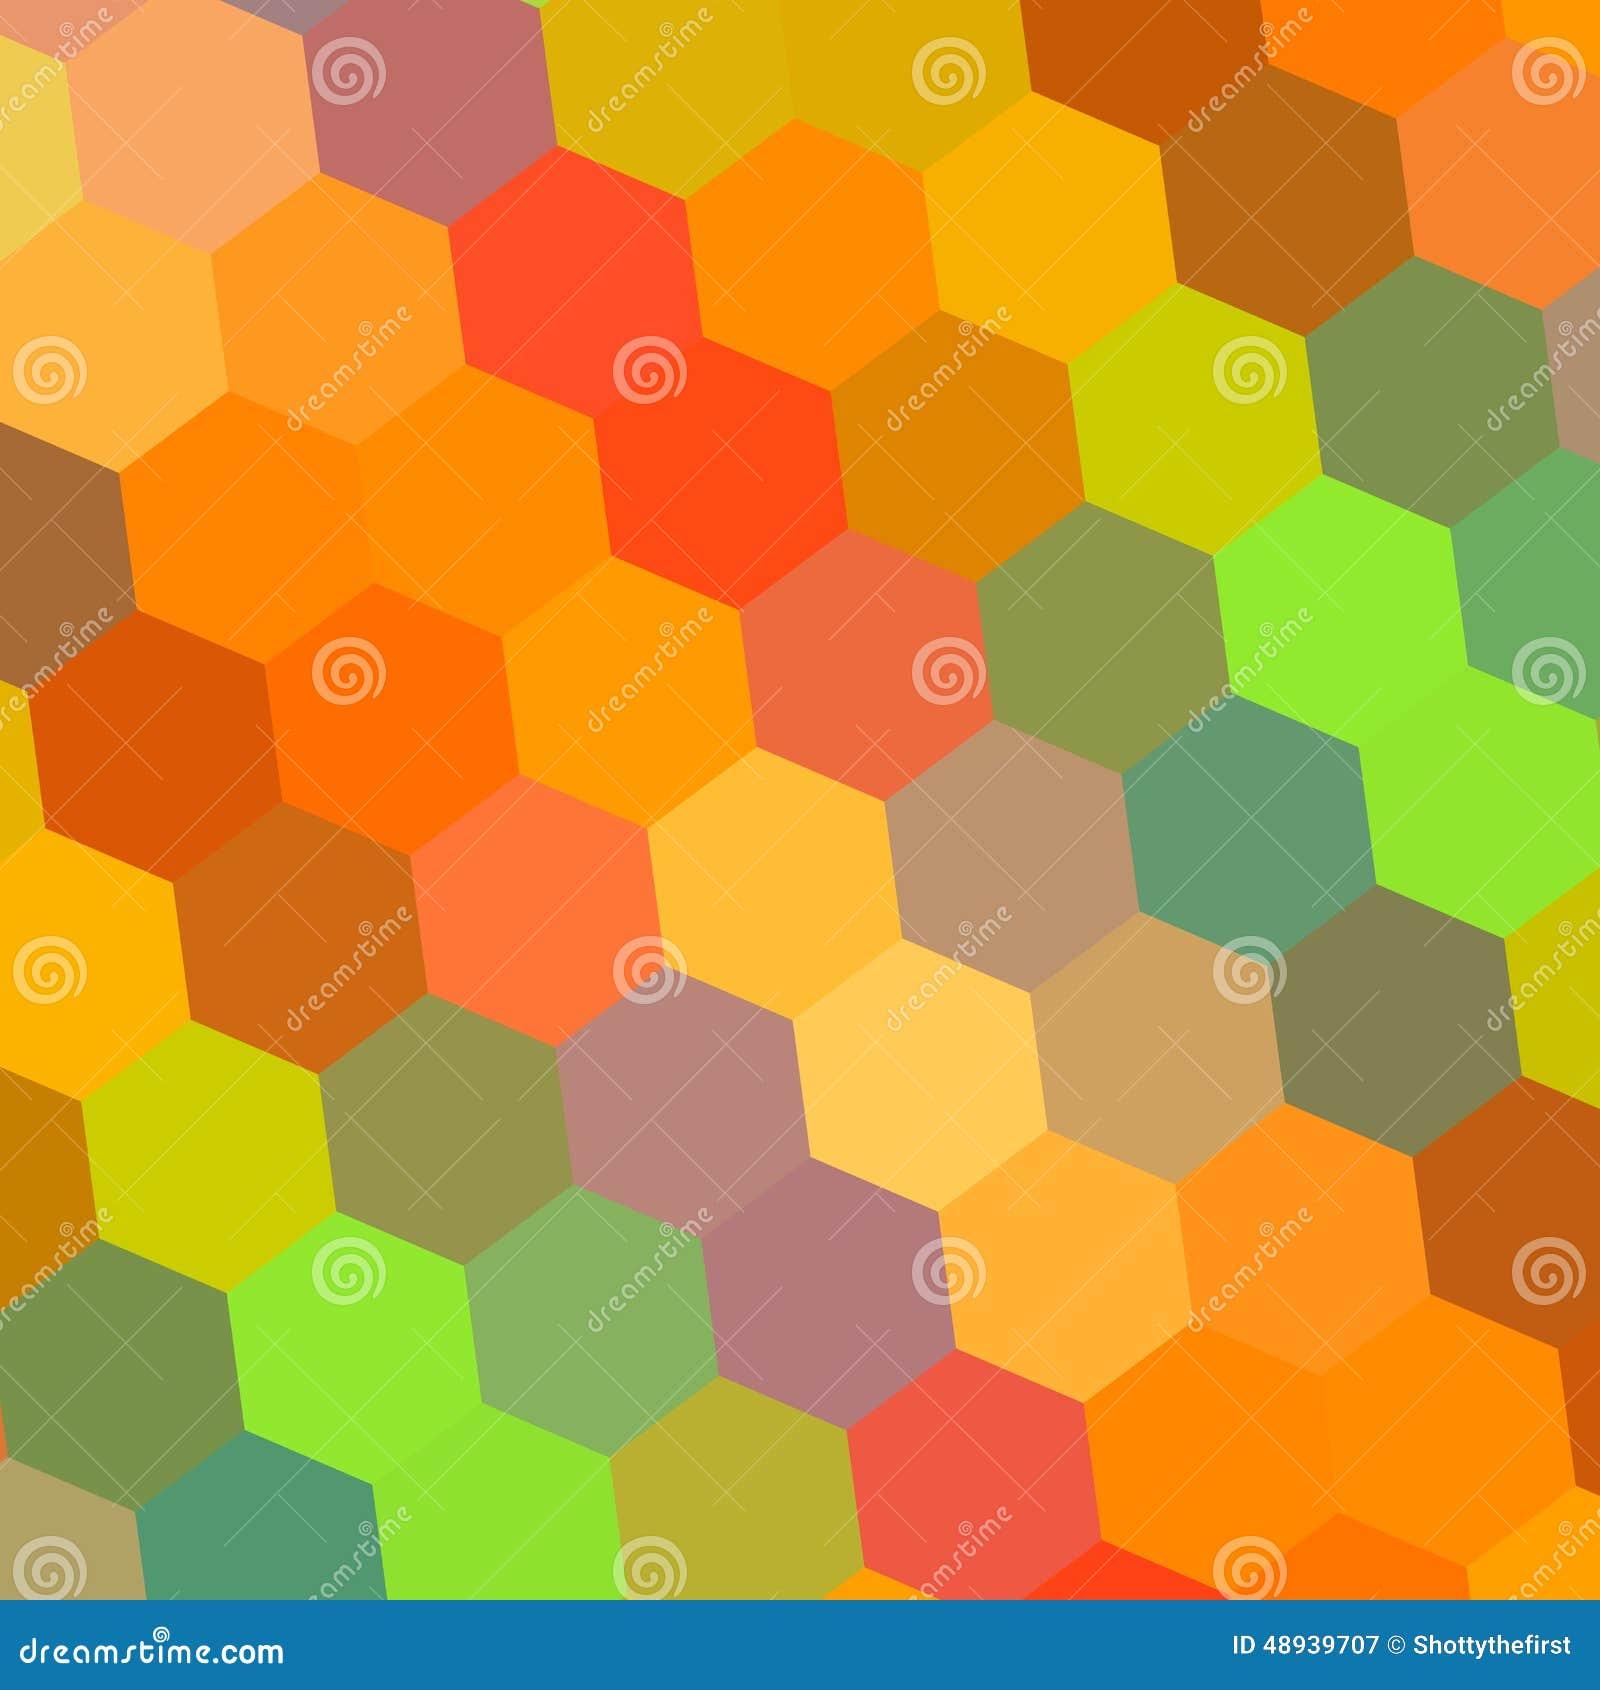 Color art digital - Royalty Free Illustration